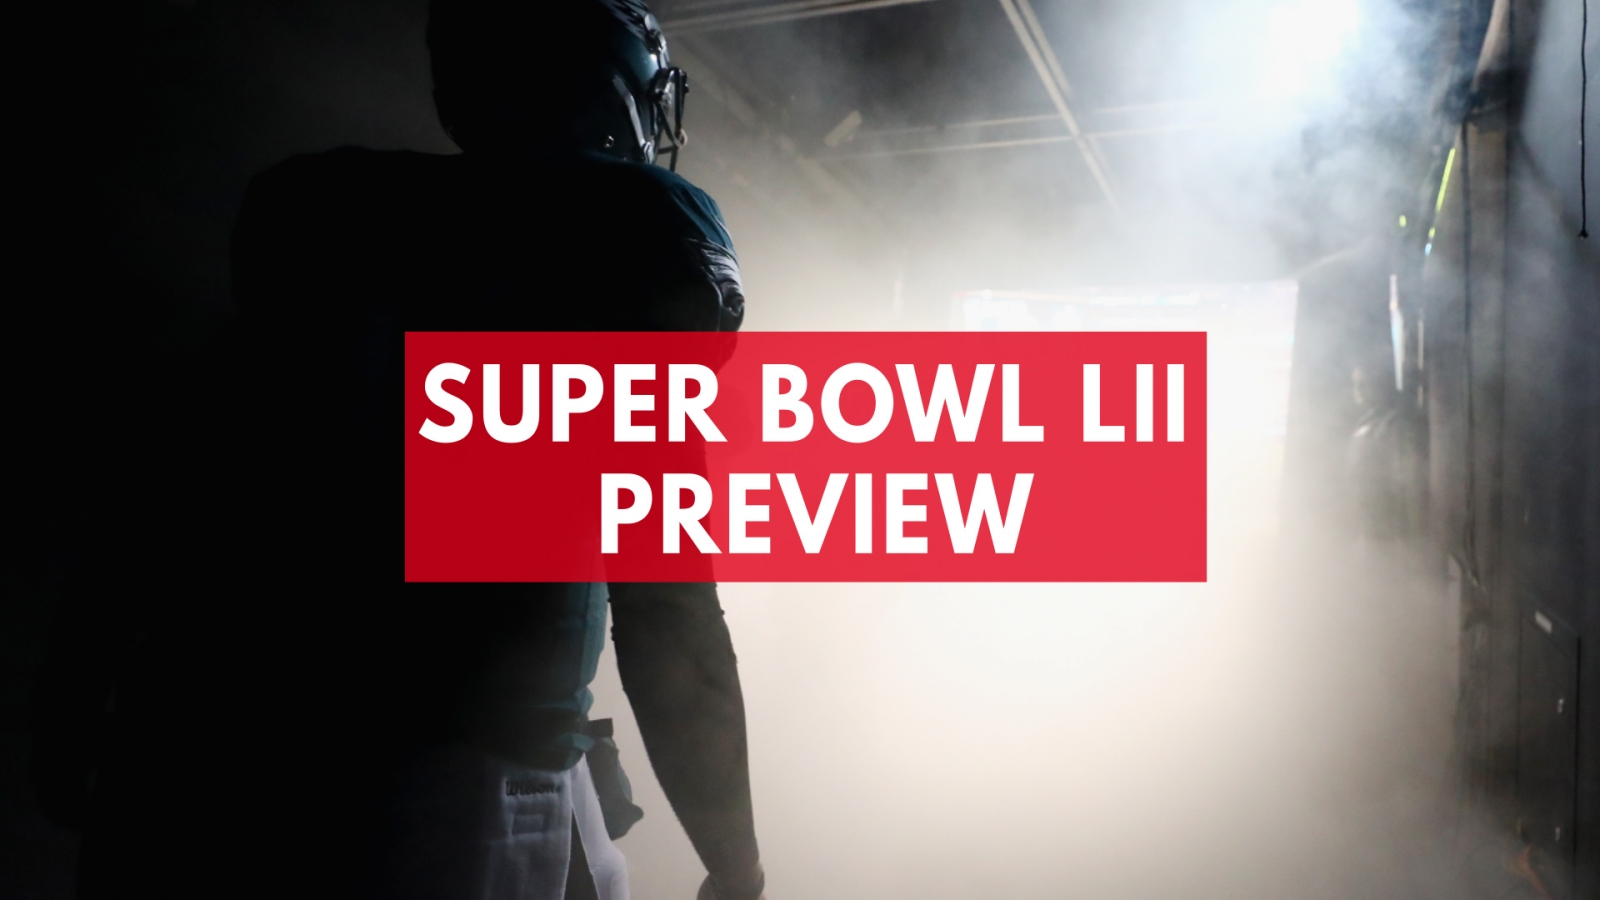 super-bowl-lii-preview-philadelphia-eagles-vs-new-england-patriots